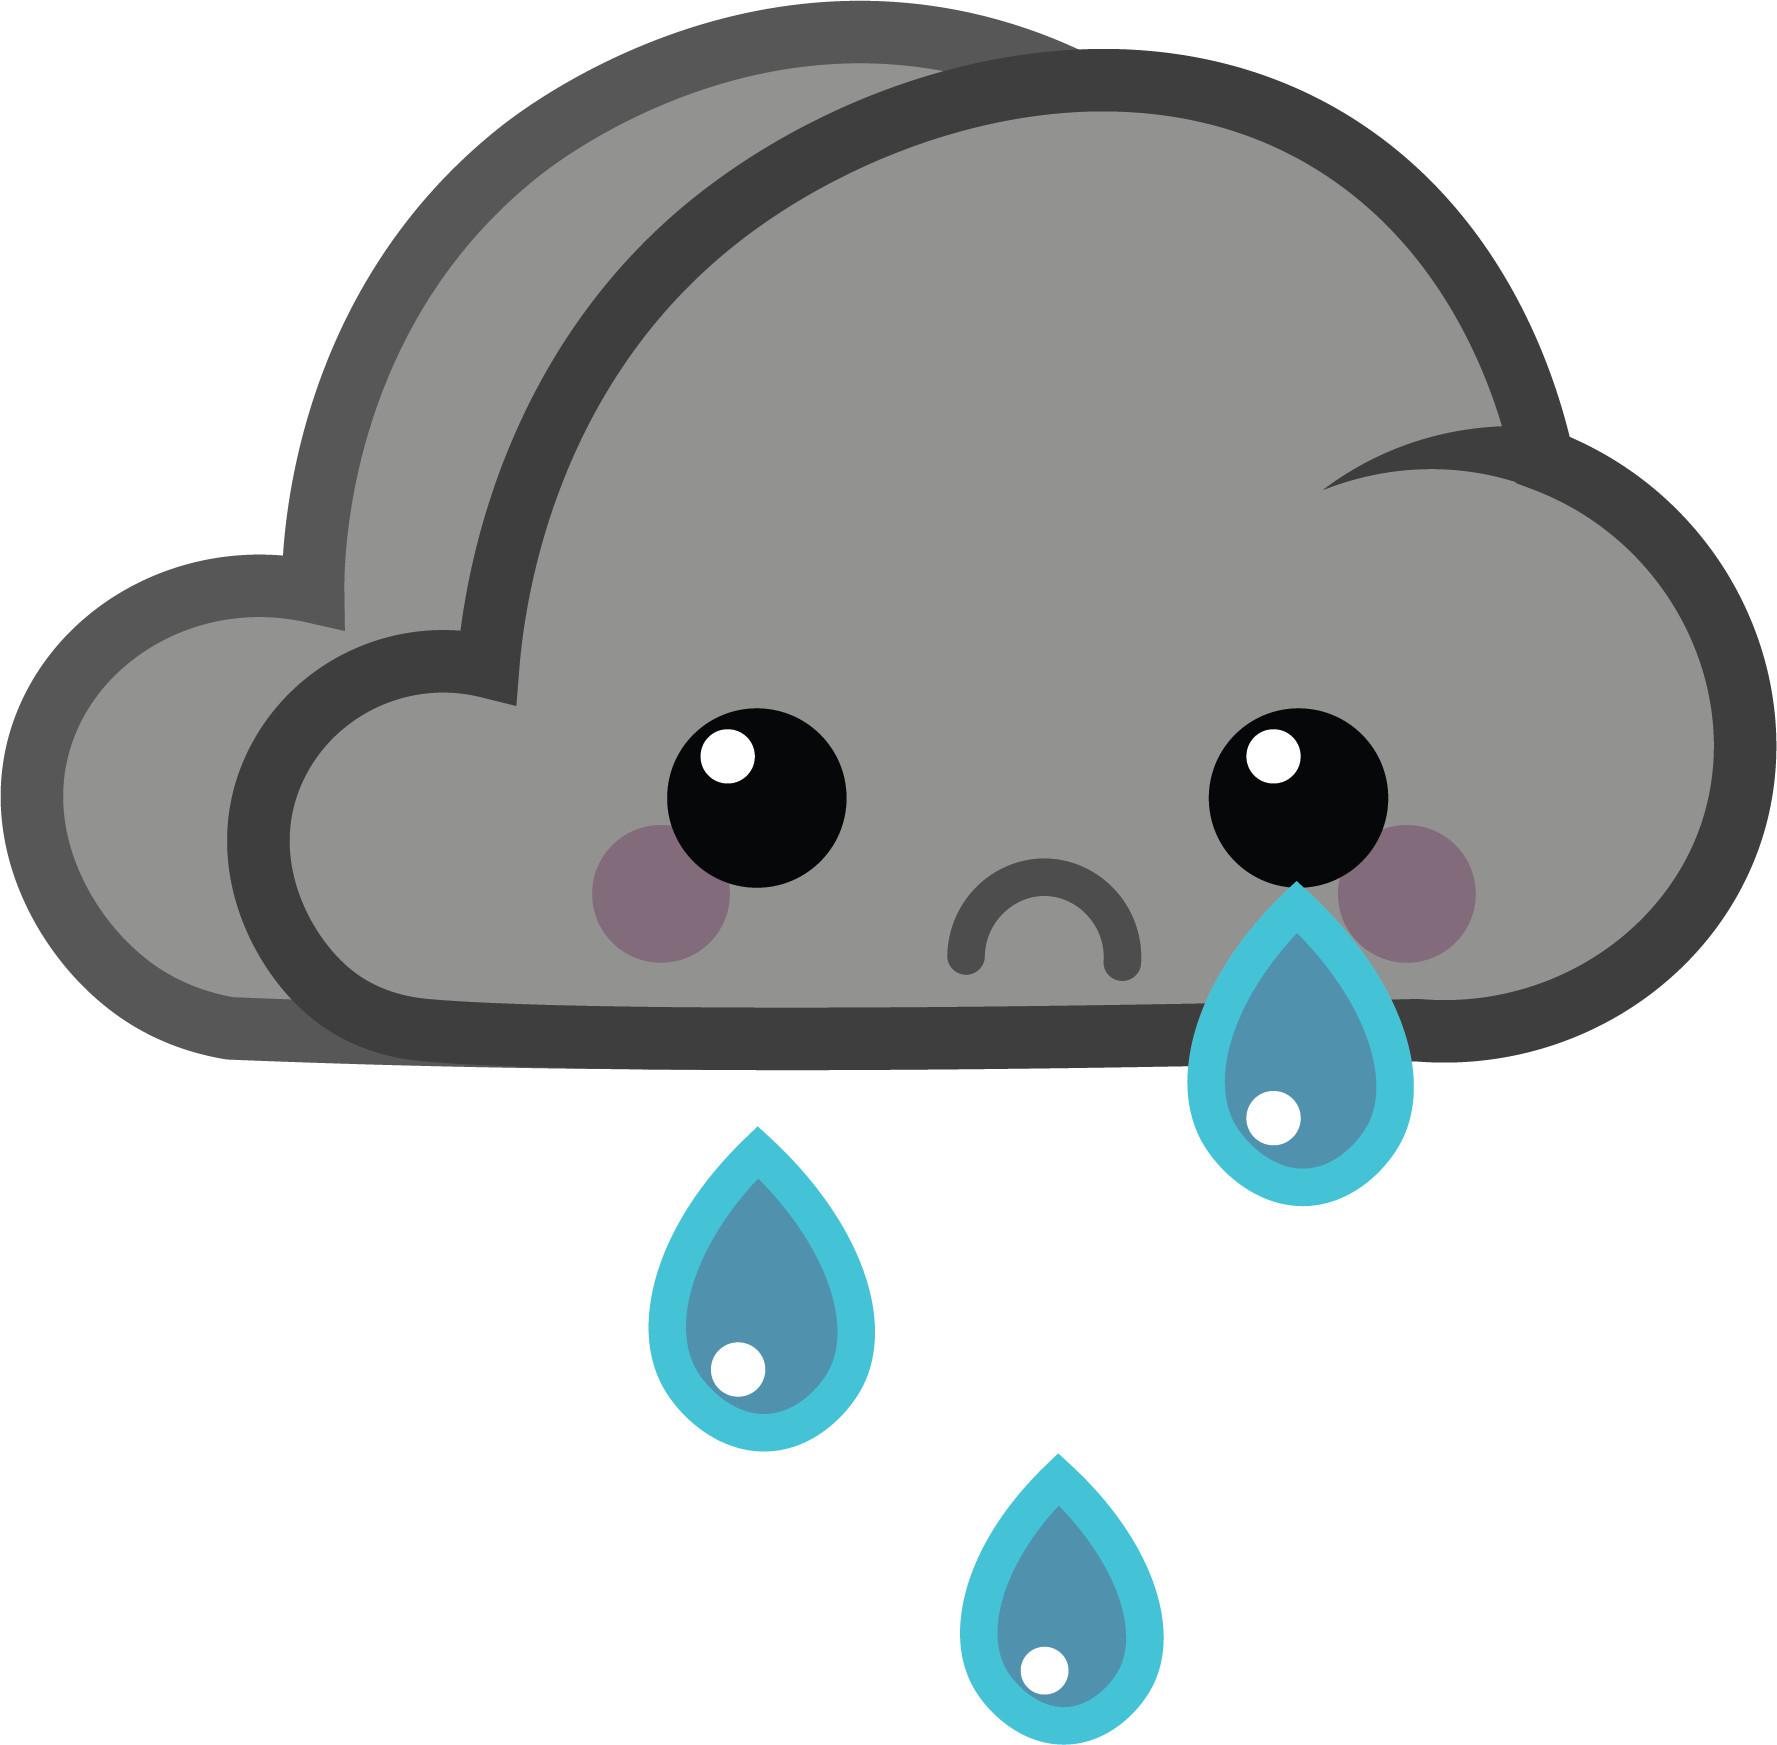 Glenn melenhorst sx cloud